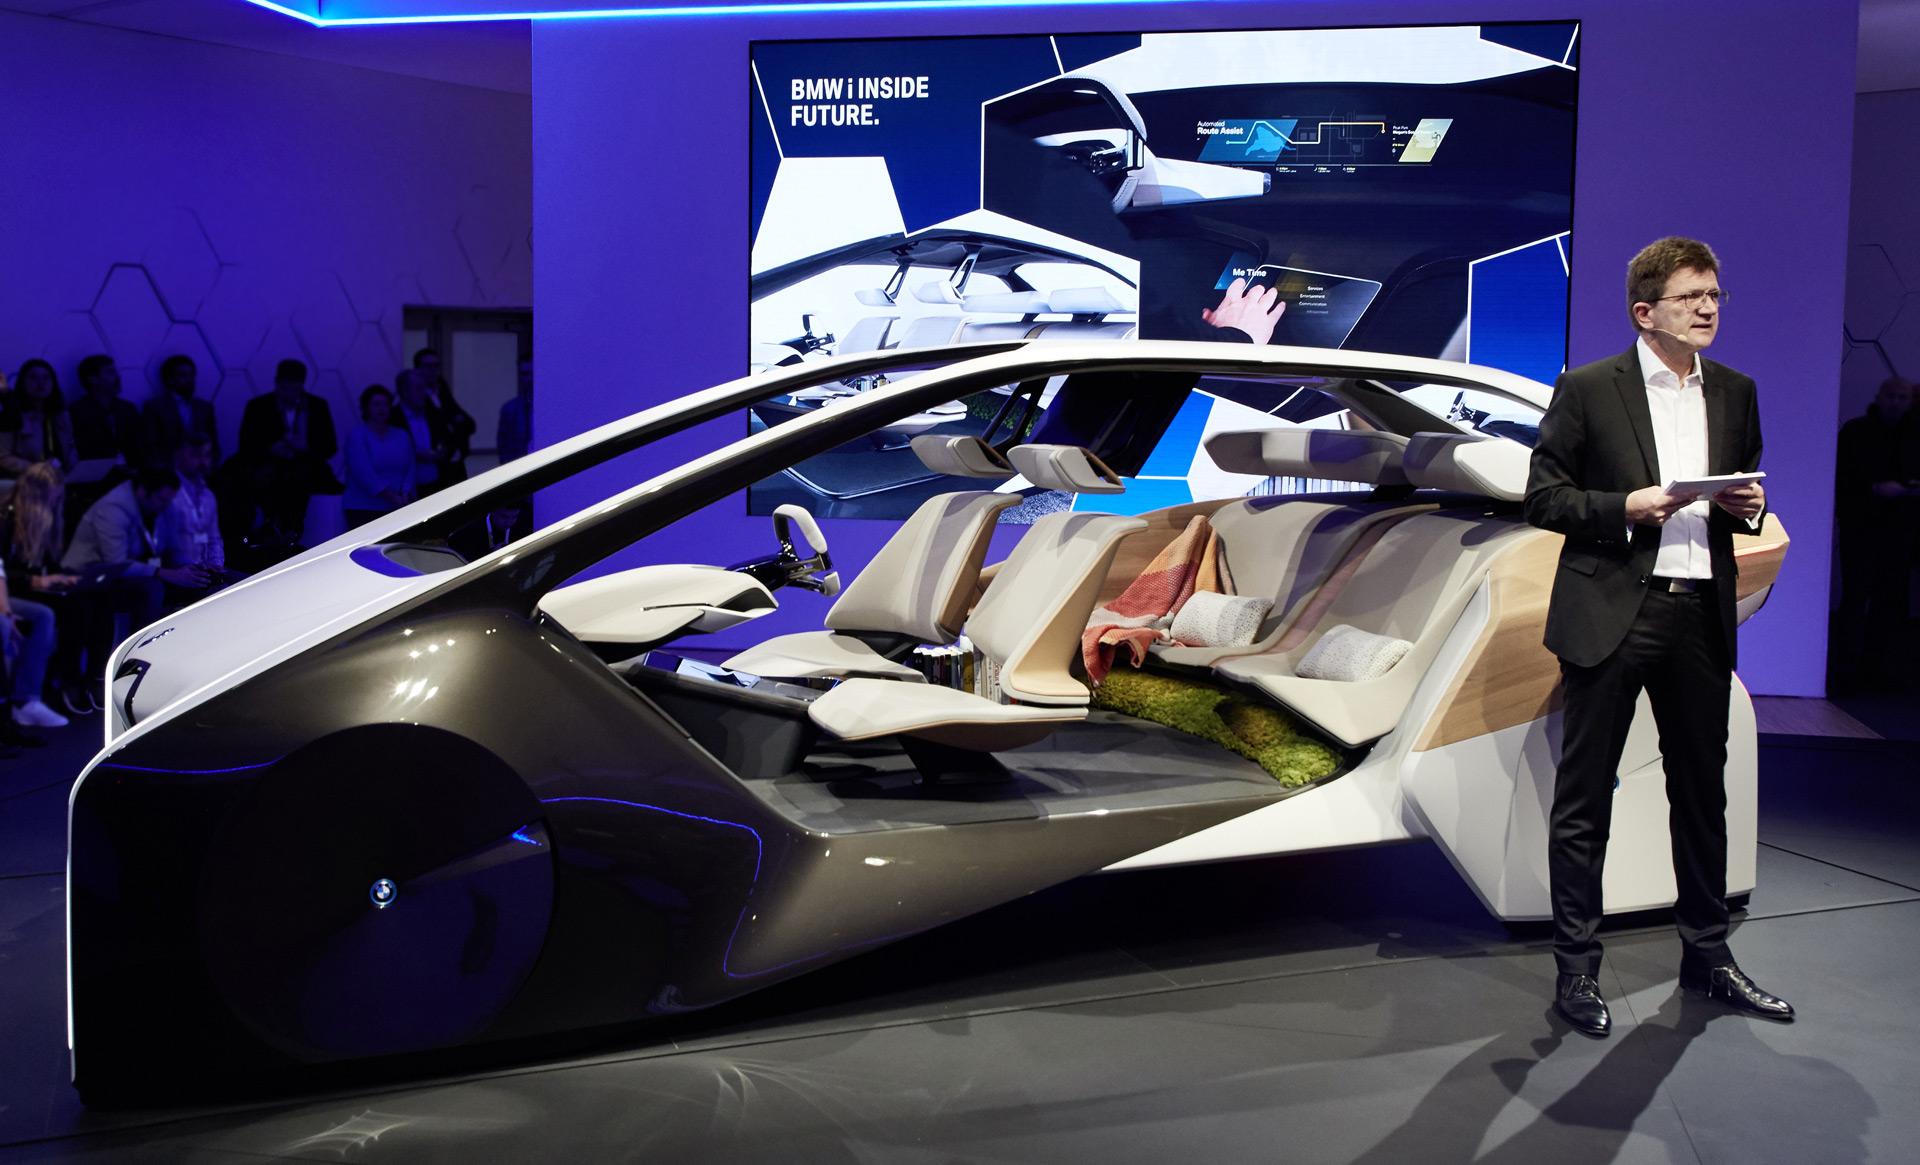 Phenomenal Bmw Previews Next Gen Interior Complete With Hologram Technology Interior Design Ideas Tzicisoteloinfo